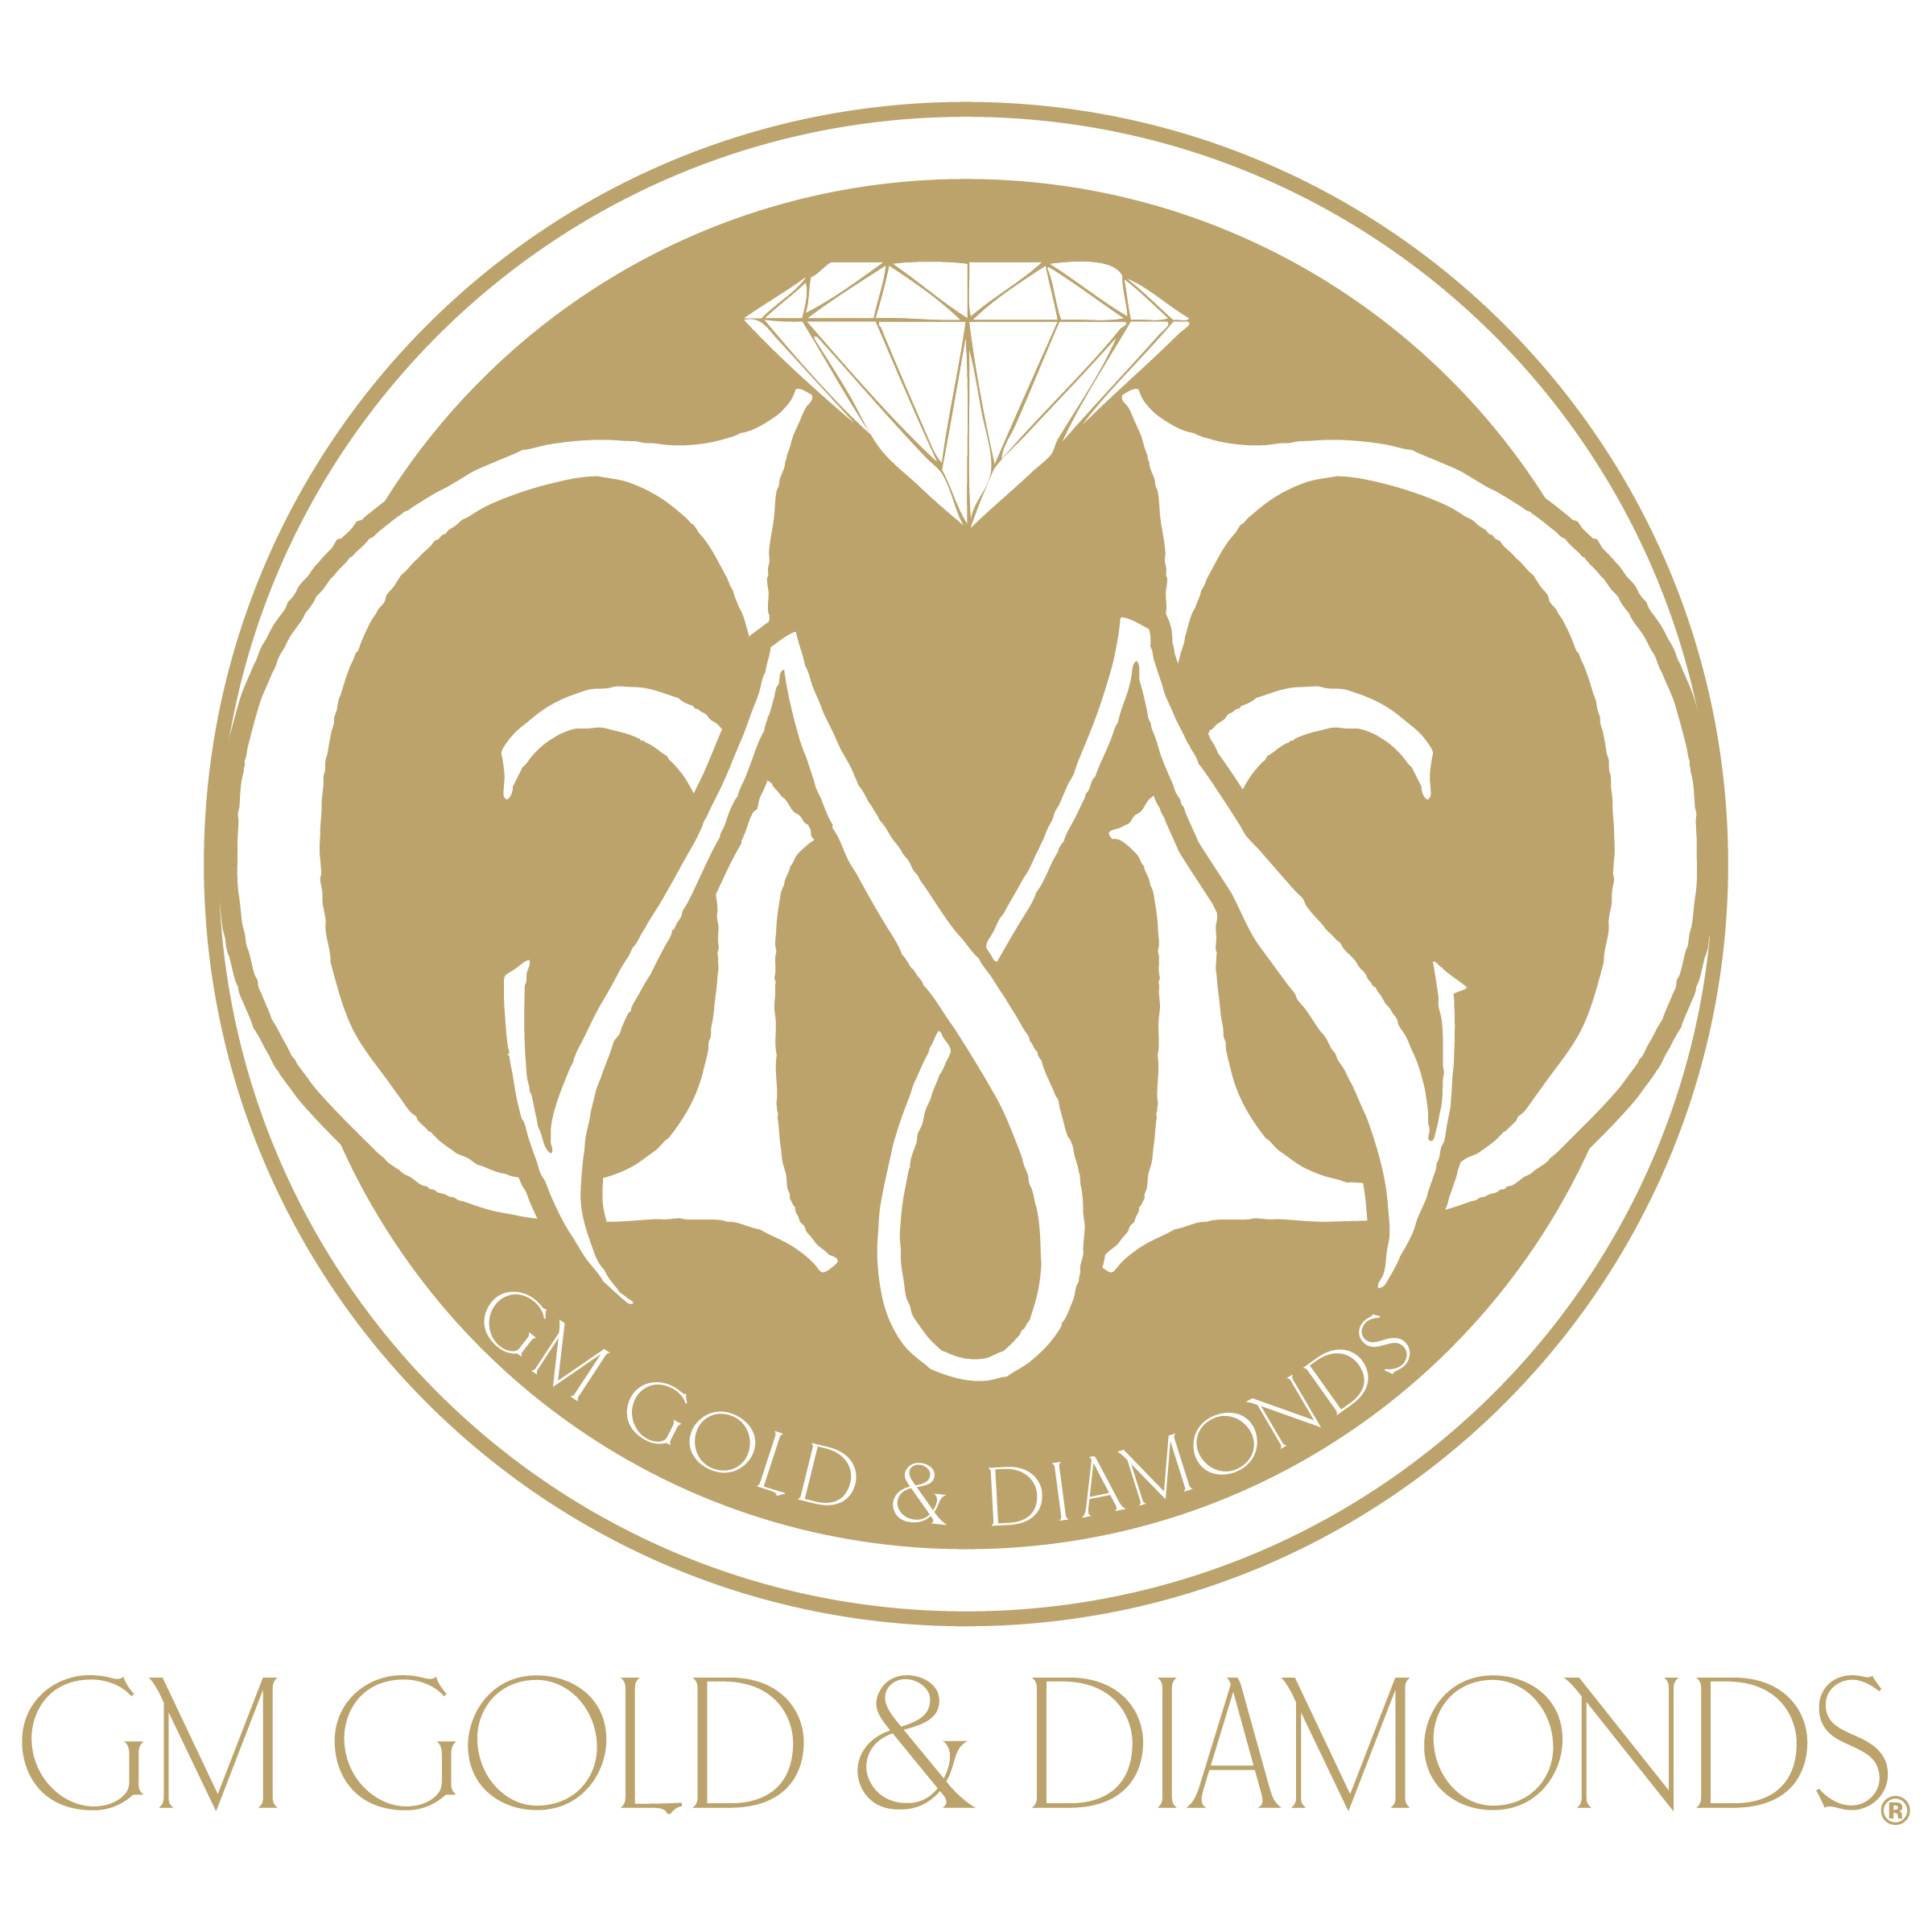 GOLD&DIAMONDS LOGO-01.jpg